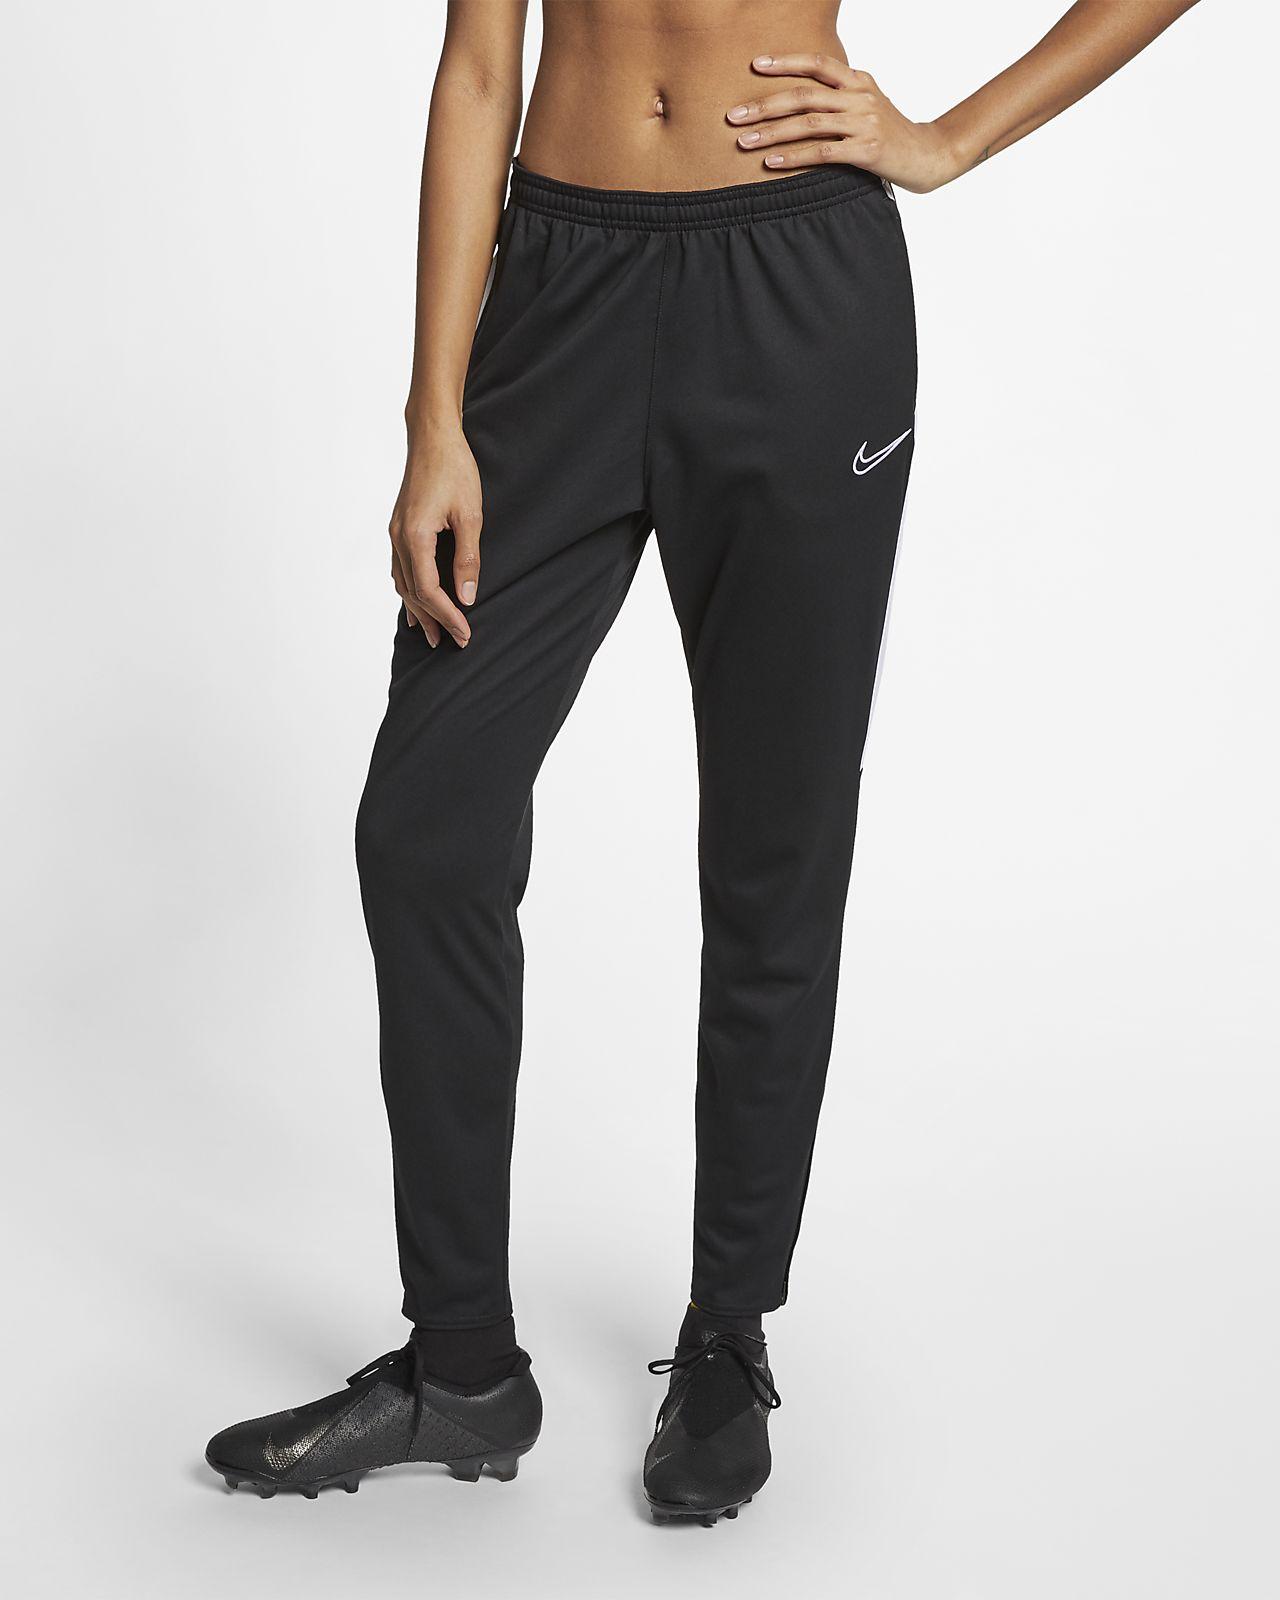 Pantaloni da calcio Nike Dri-FIT Academy - Donna